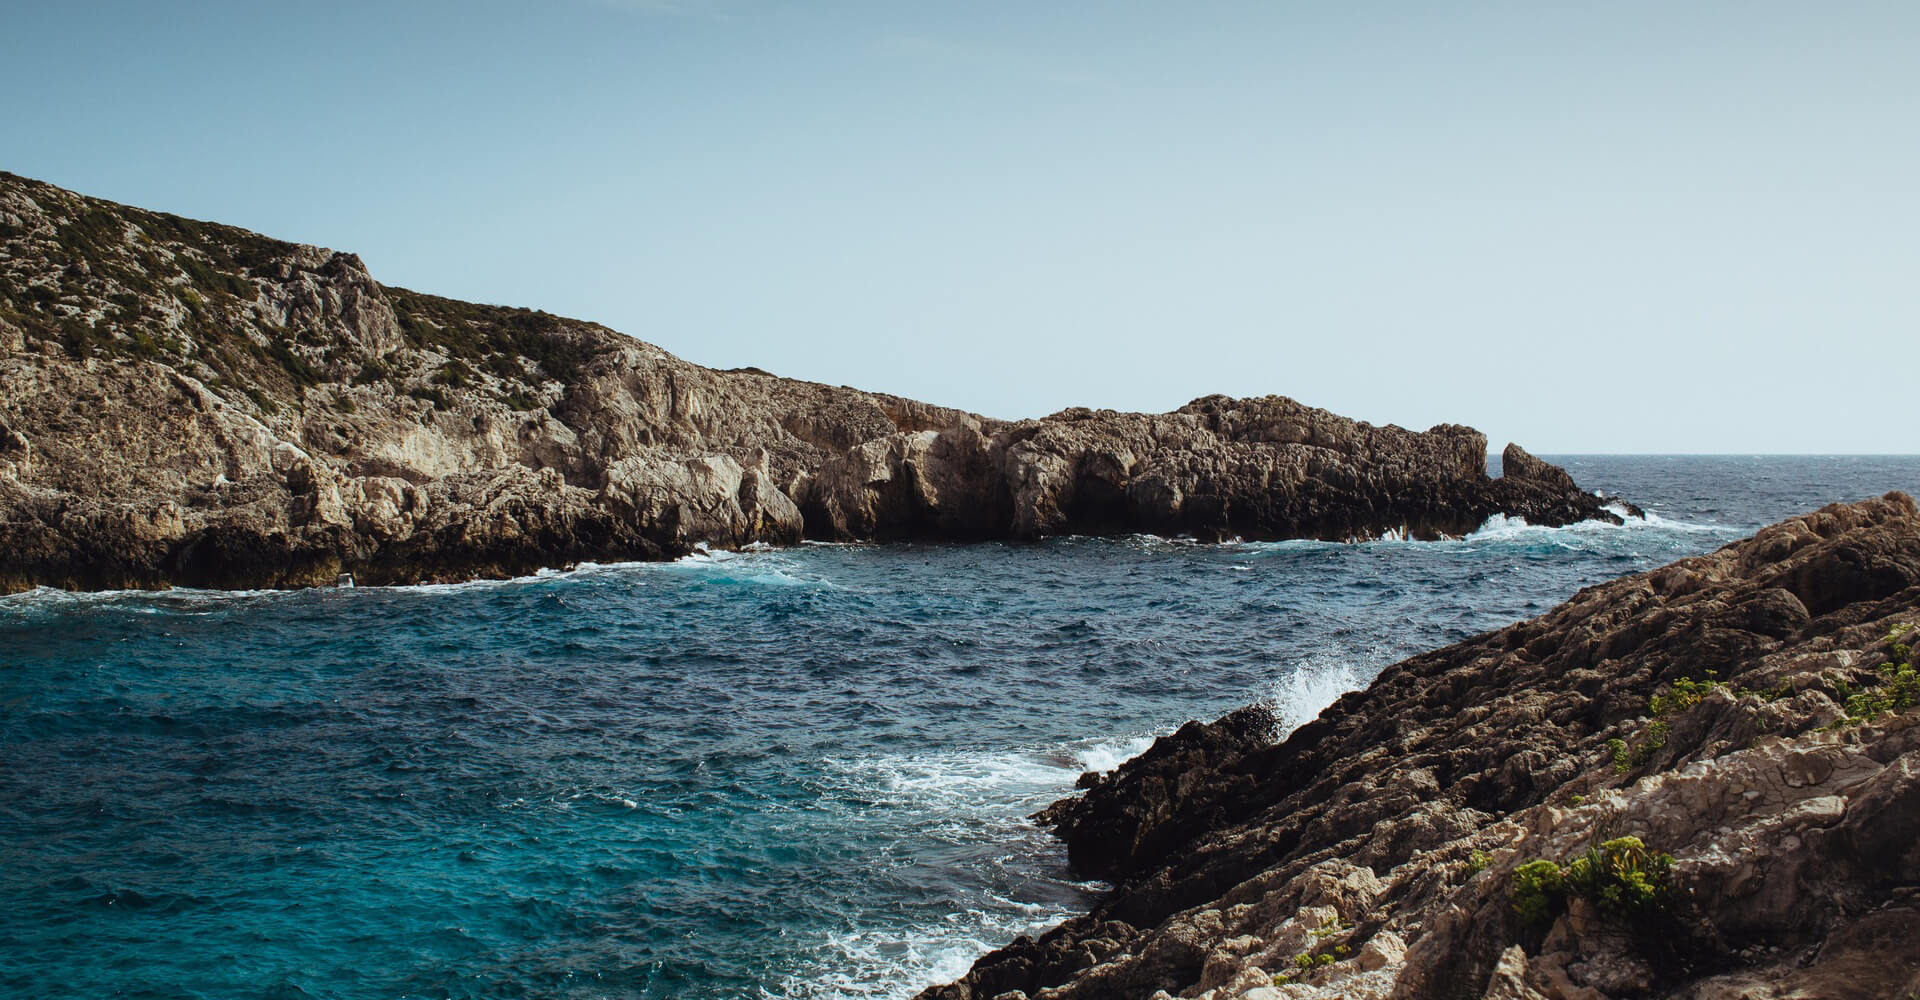 beach-landscape-sea-coast-nature